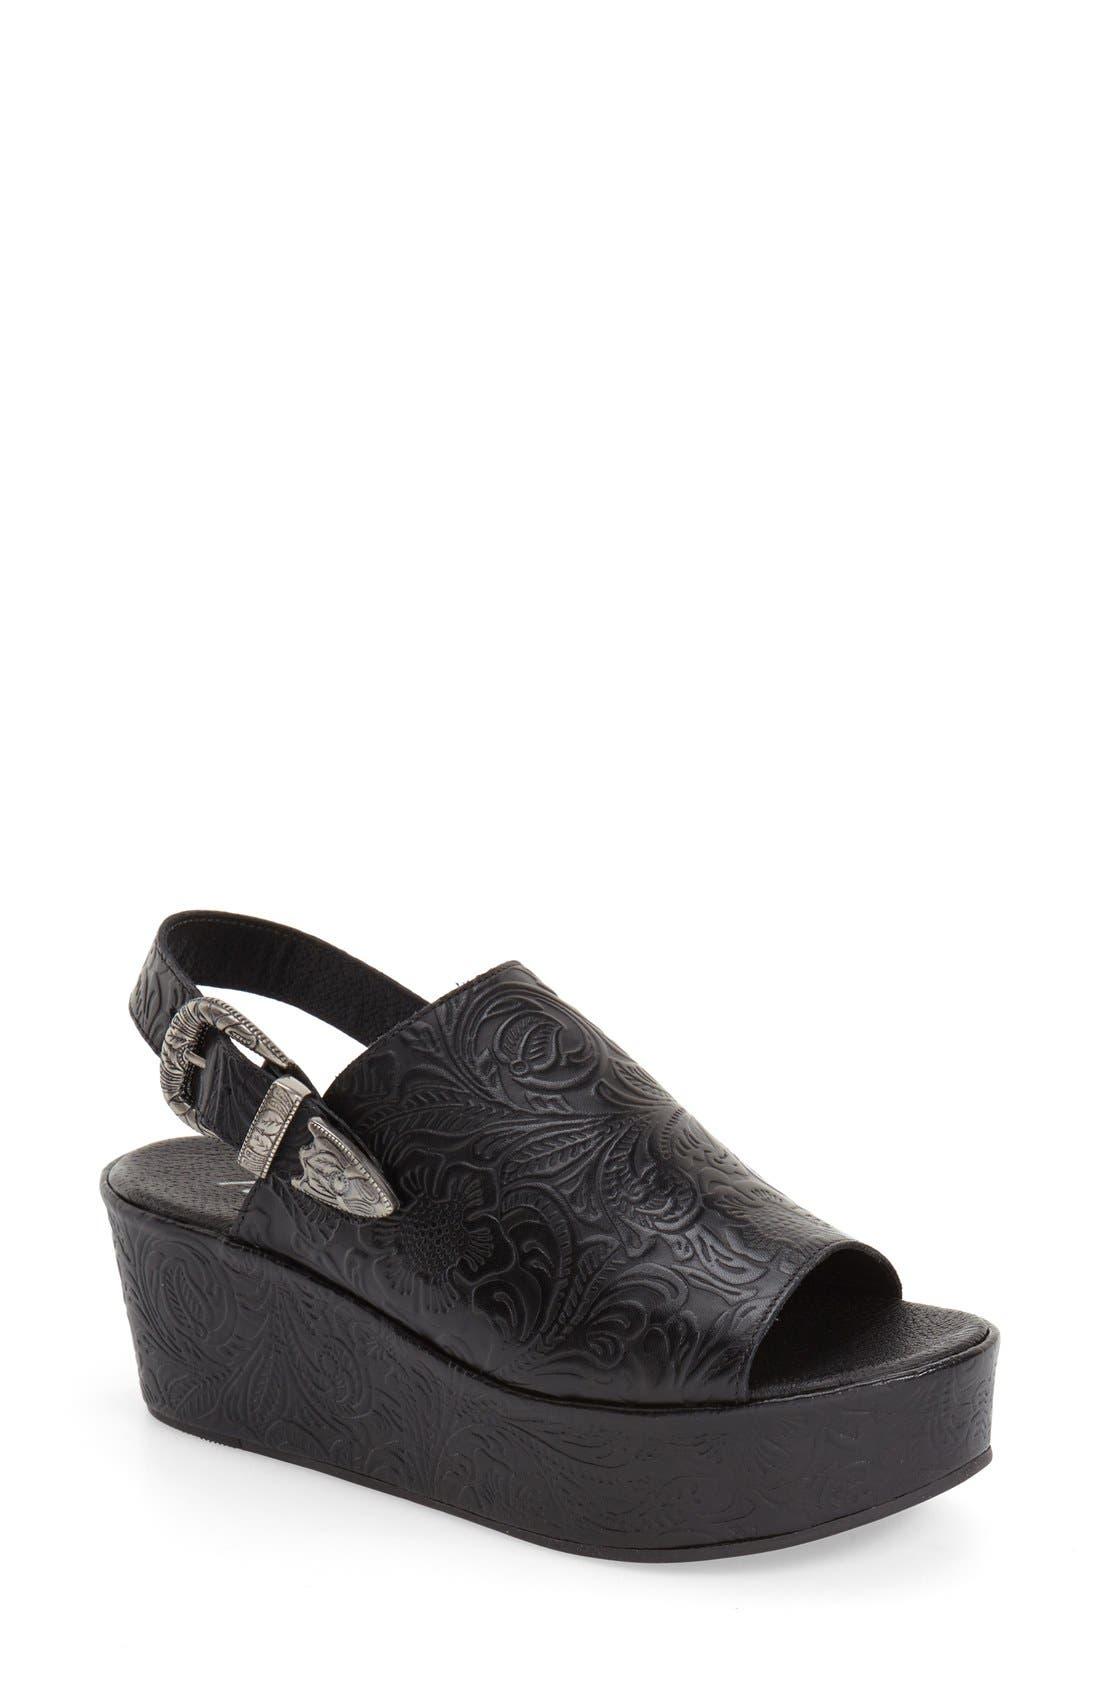 Main Image - Matisse Embossed Slingback Platform Sandal (Women)